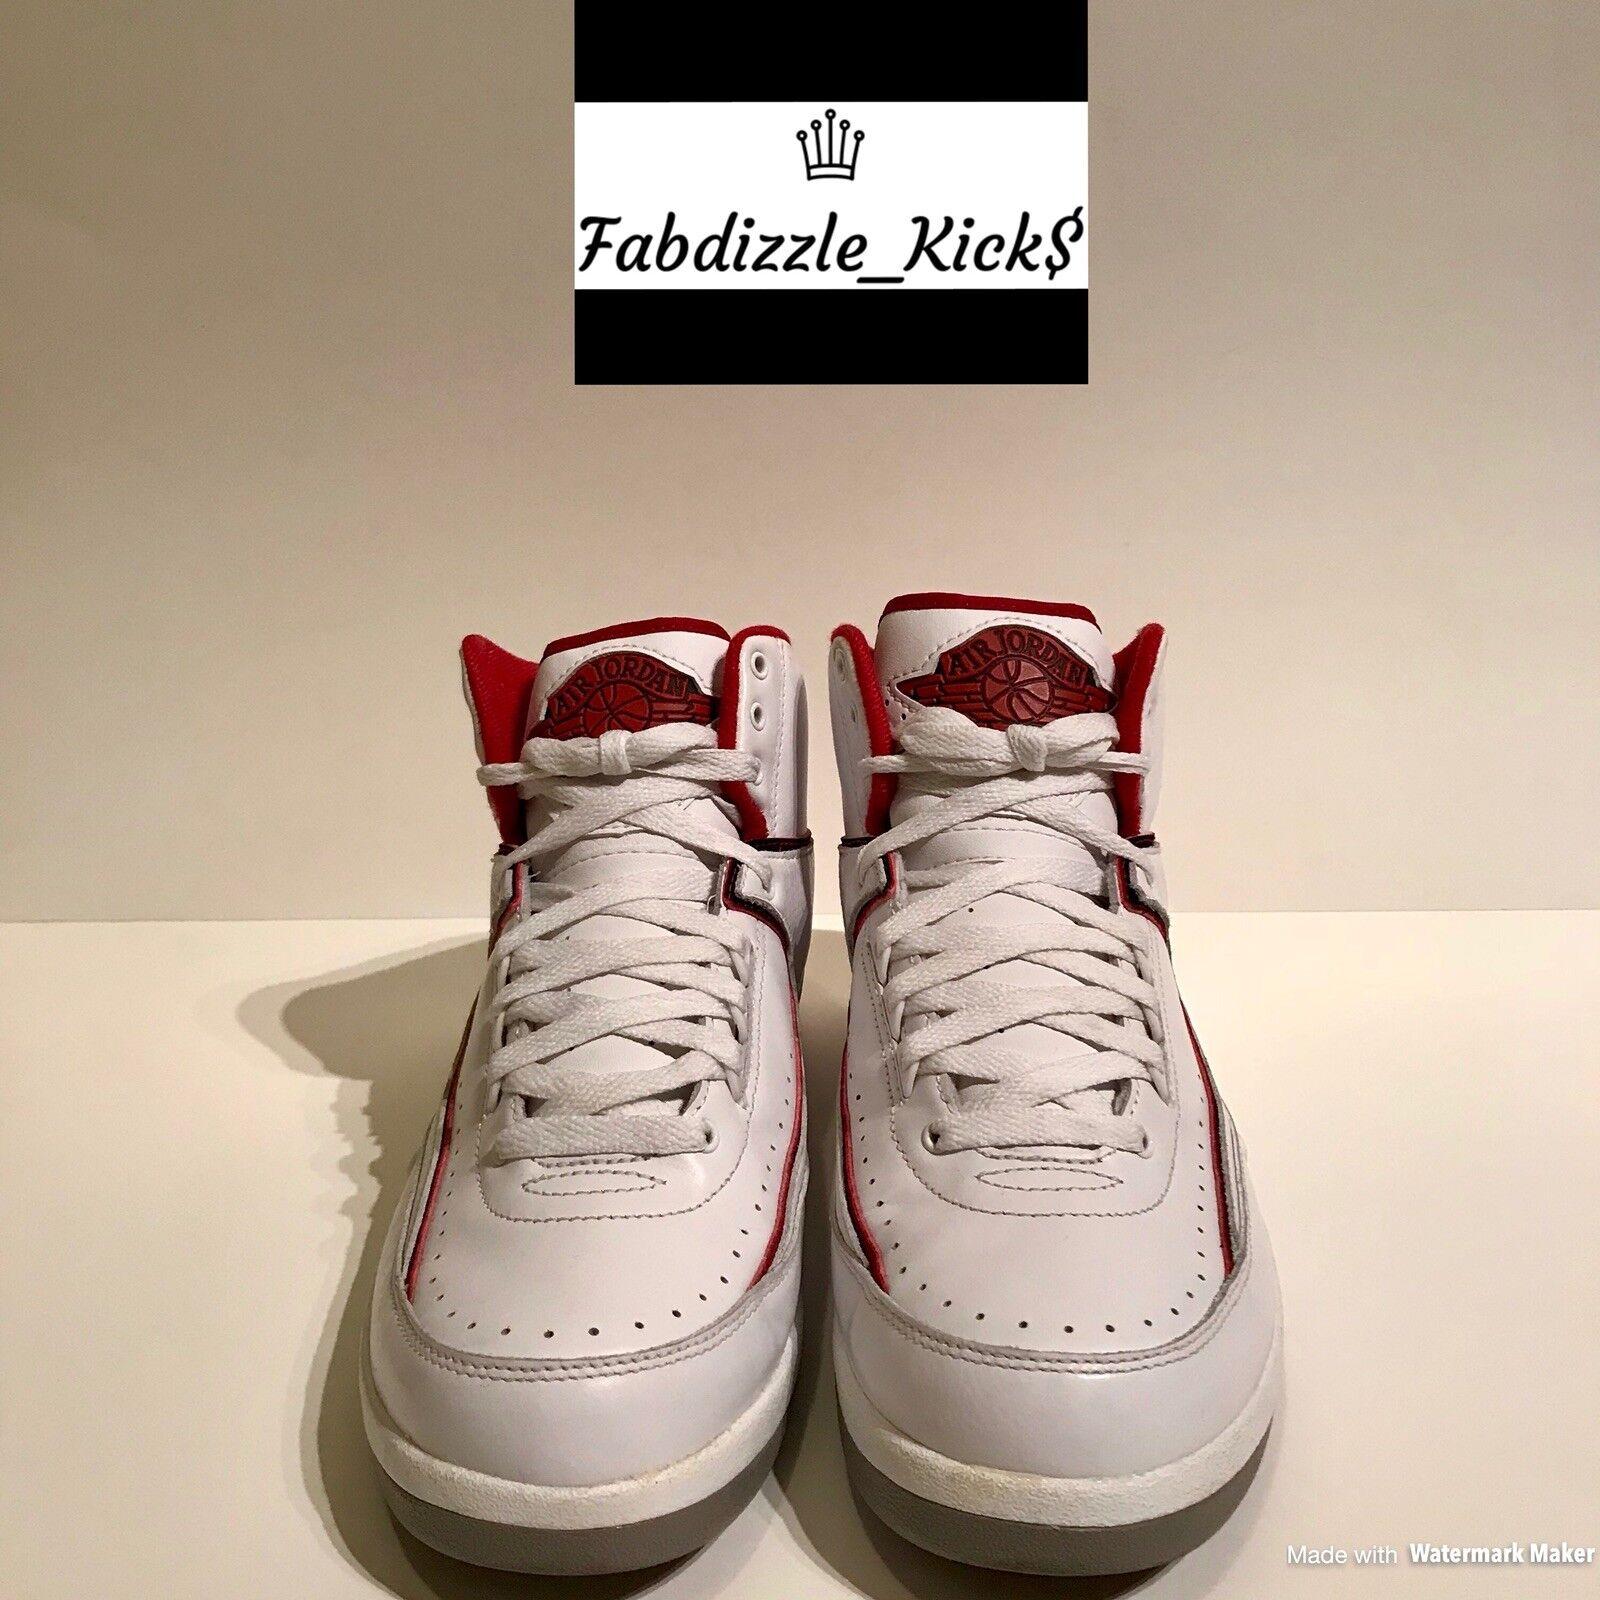 Air Jordan 2 Retro Colorway White/Black-Varsity Red- Size 8